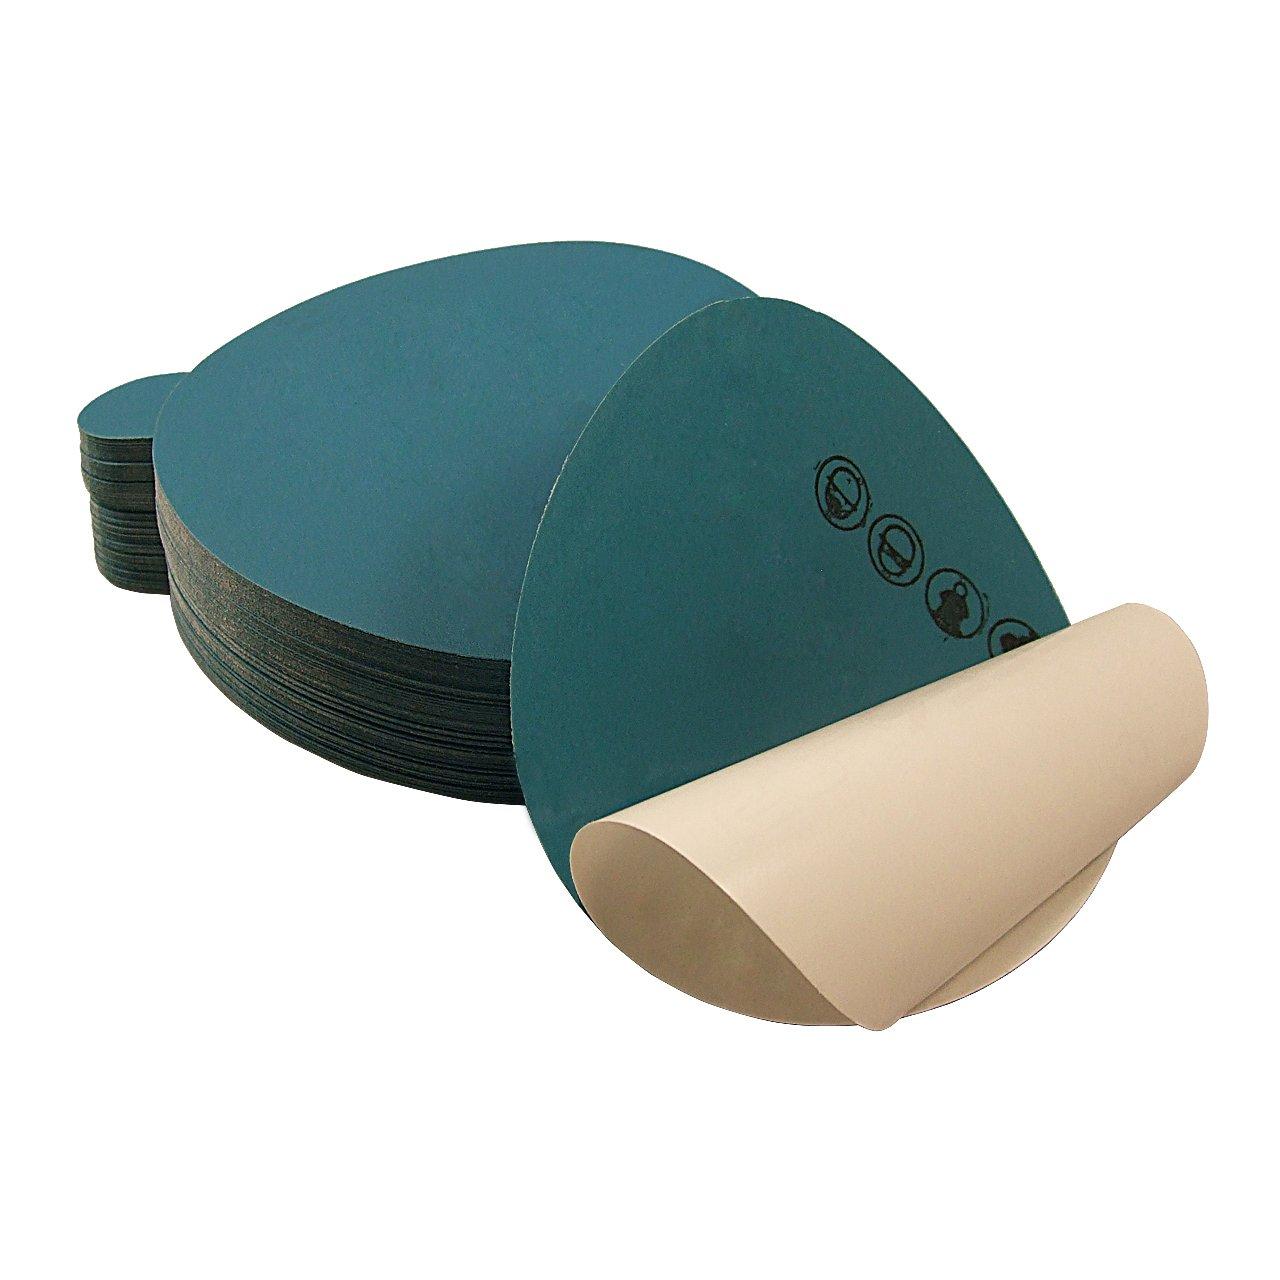 50-Pack 5 Inch 1000 Grit Adhesive Back PSA Auto Body Film Sanding Discs